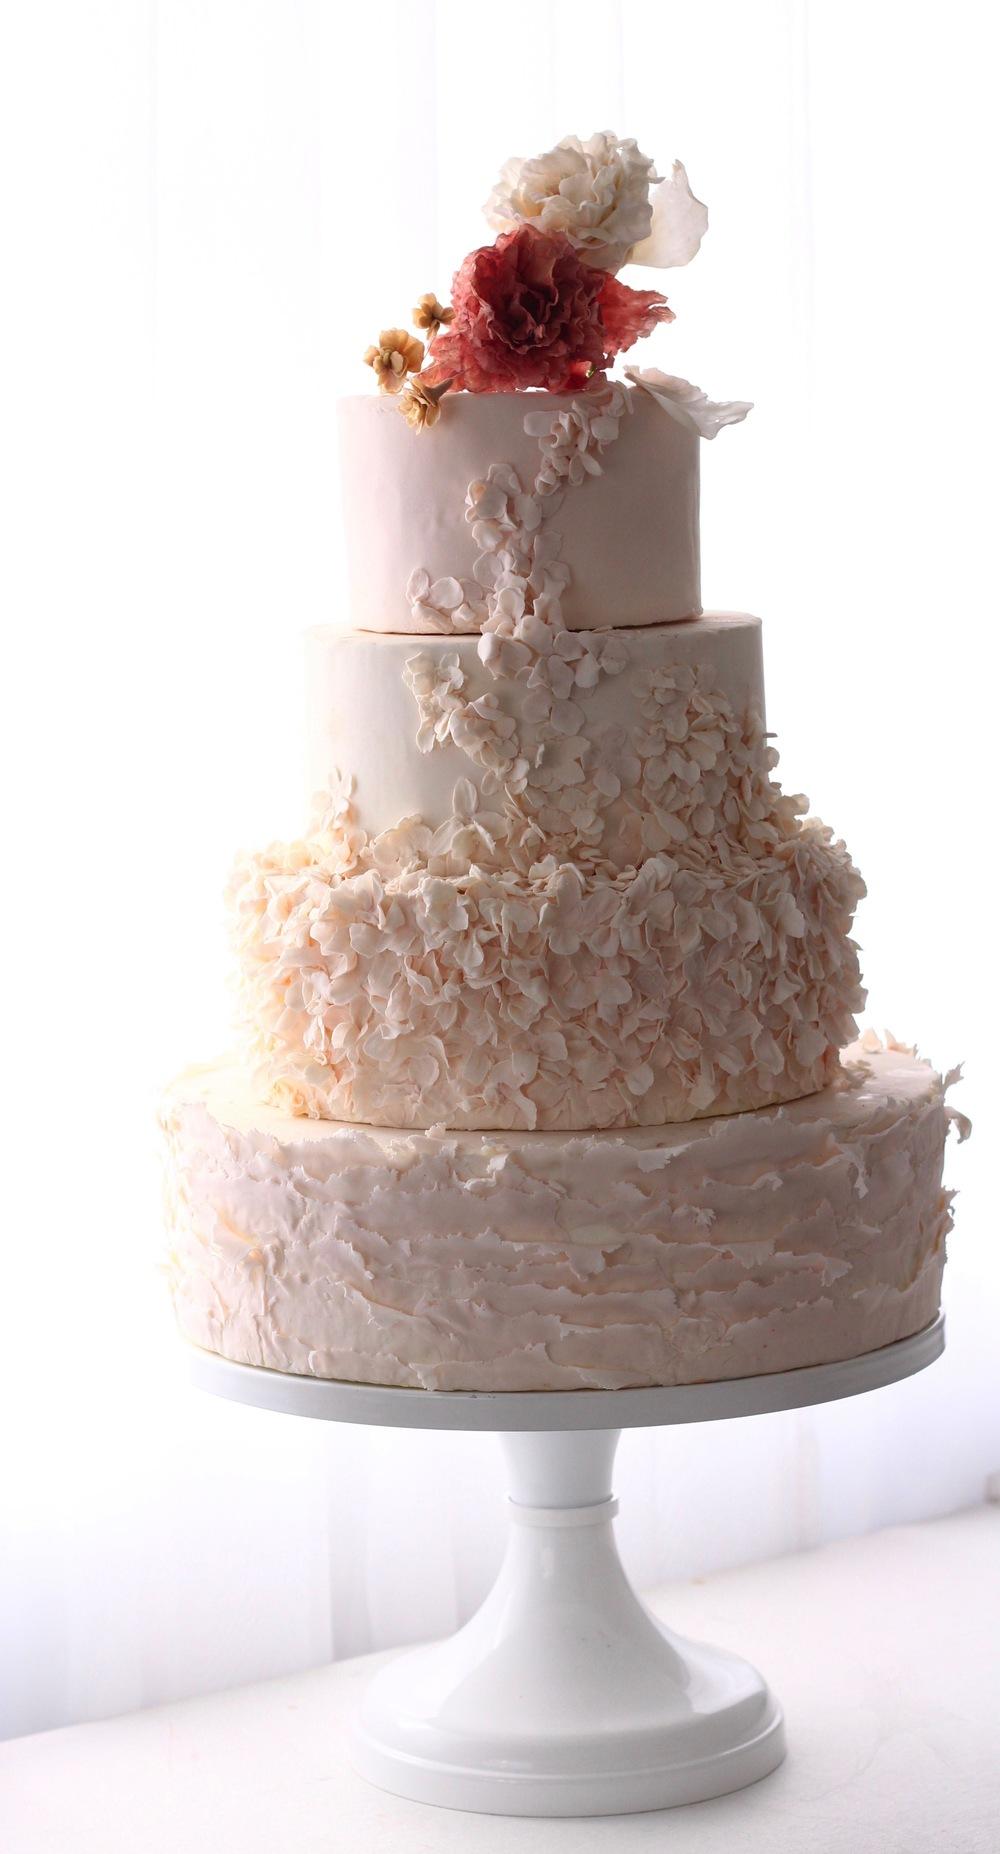 jaime gerard cake wedding cakes trinidad and tobago